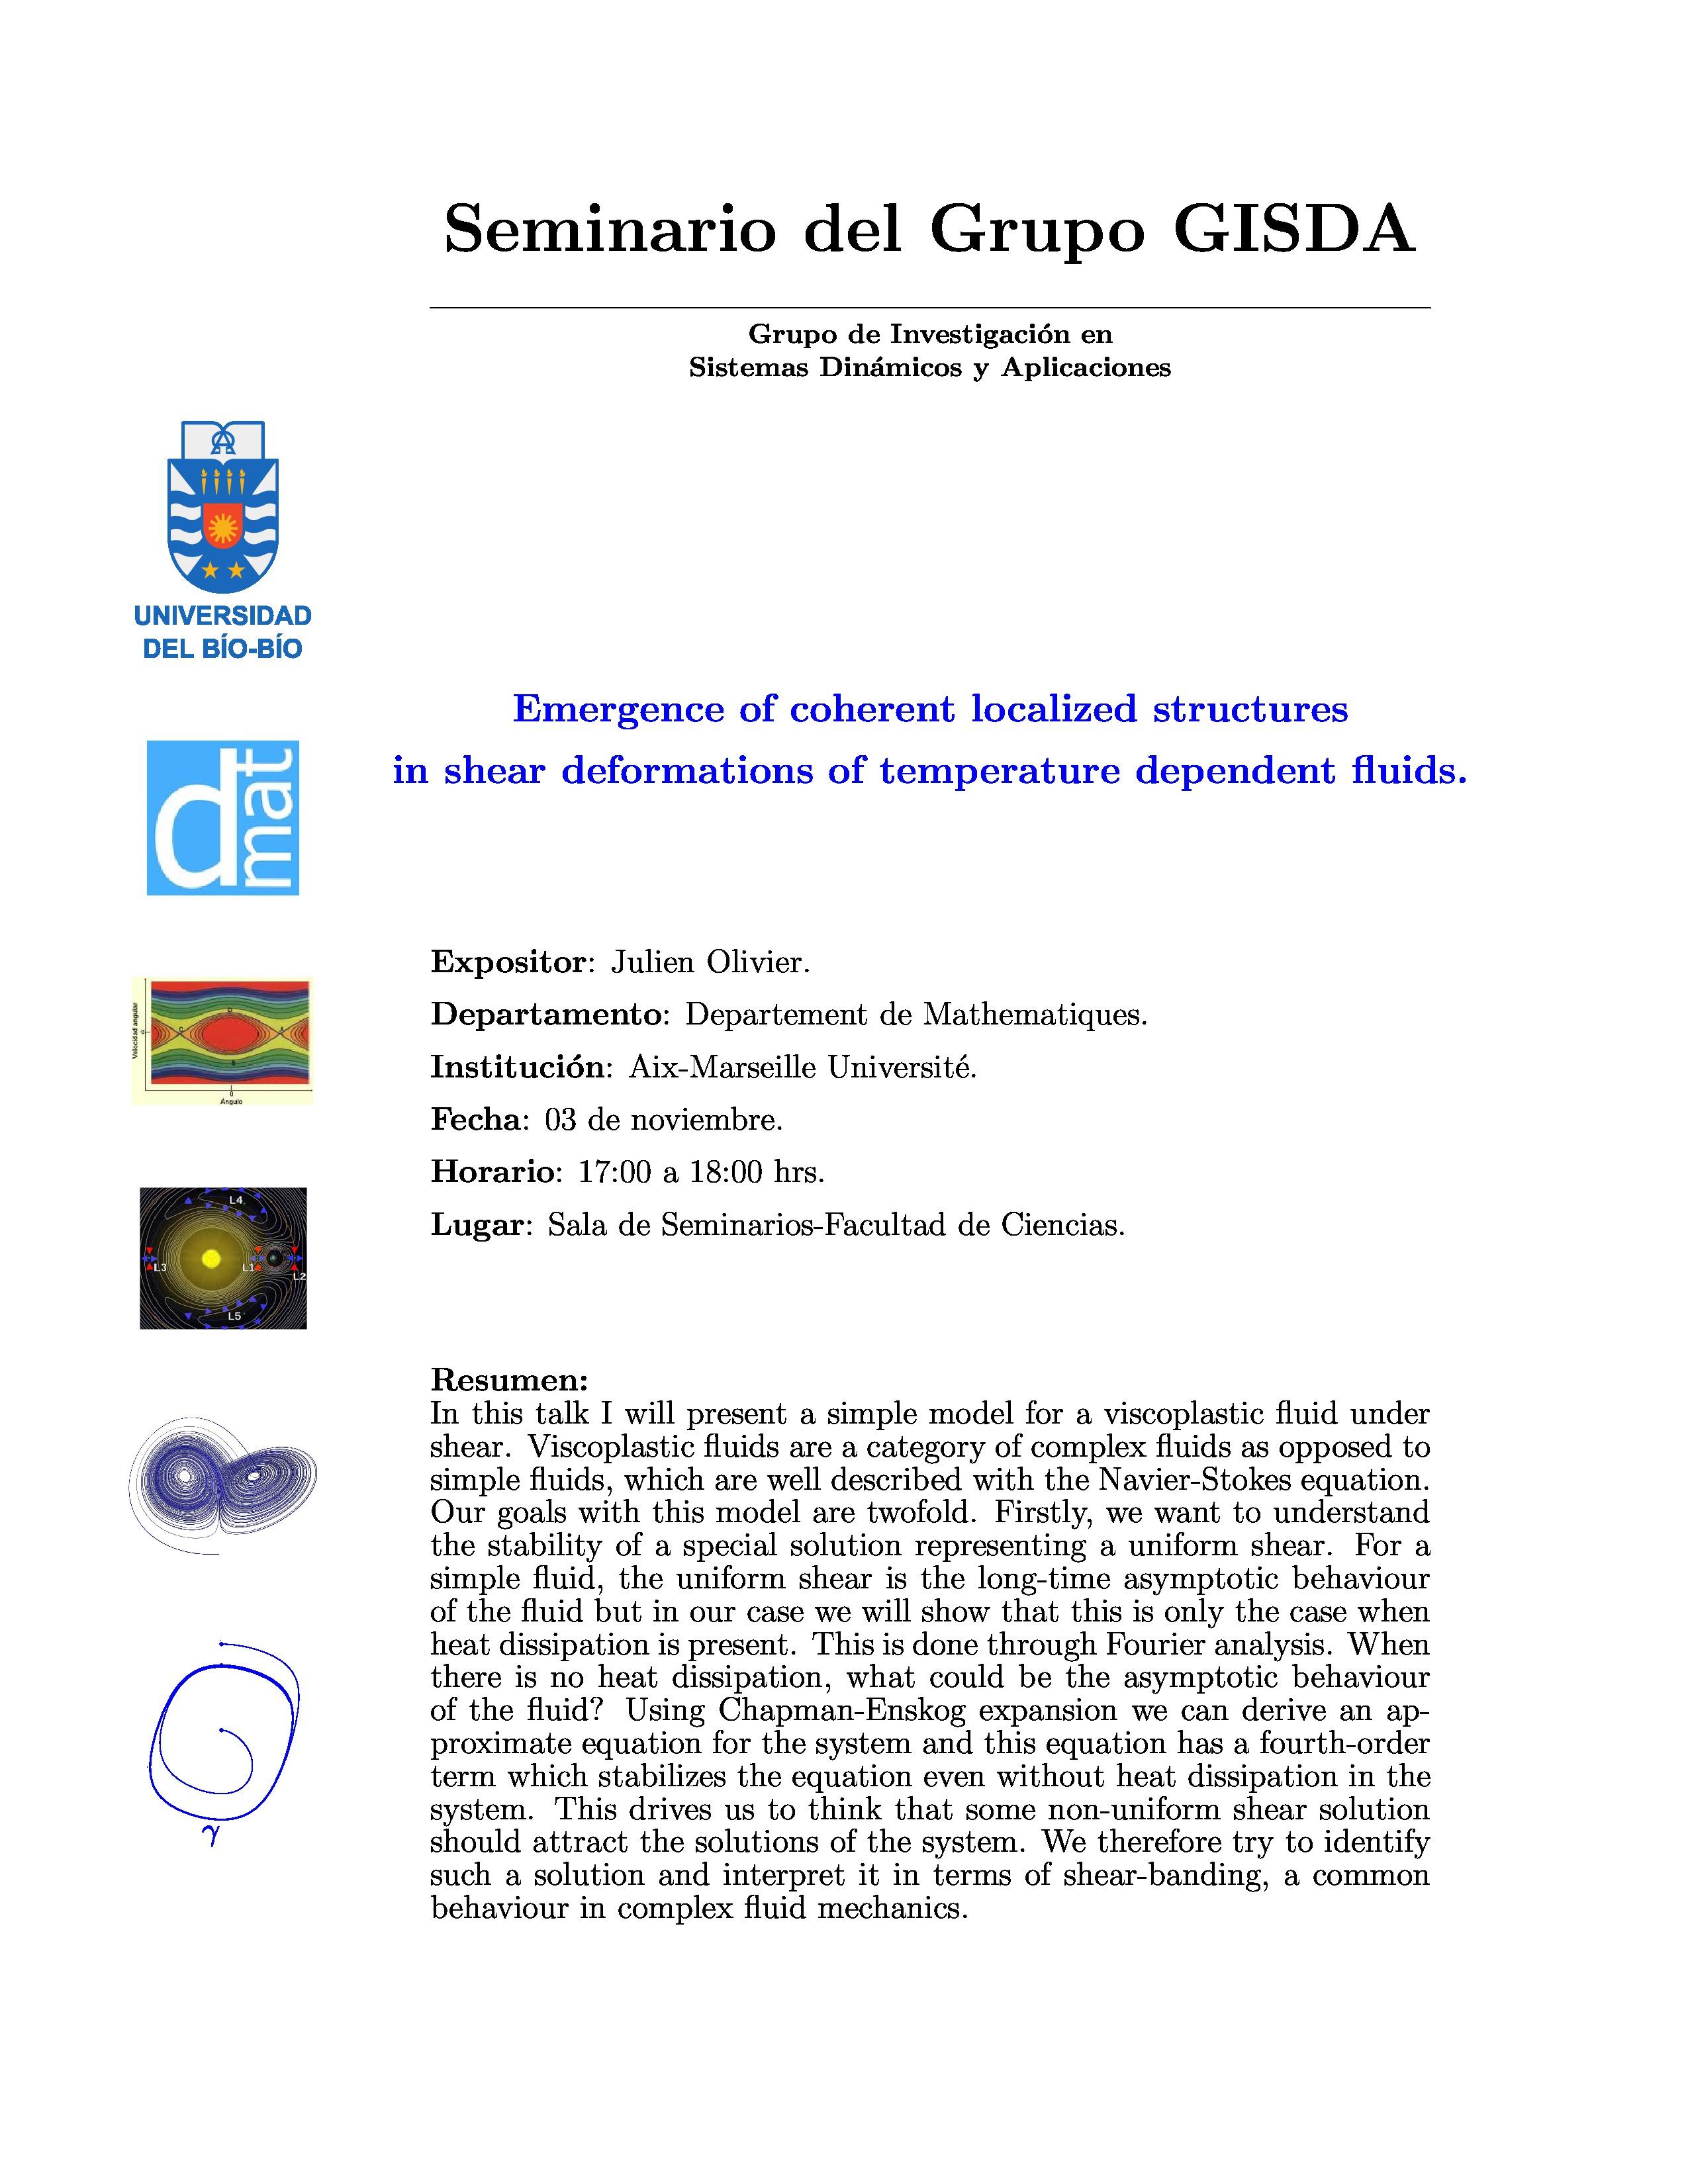 seminario-olivier20161103